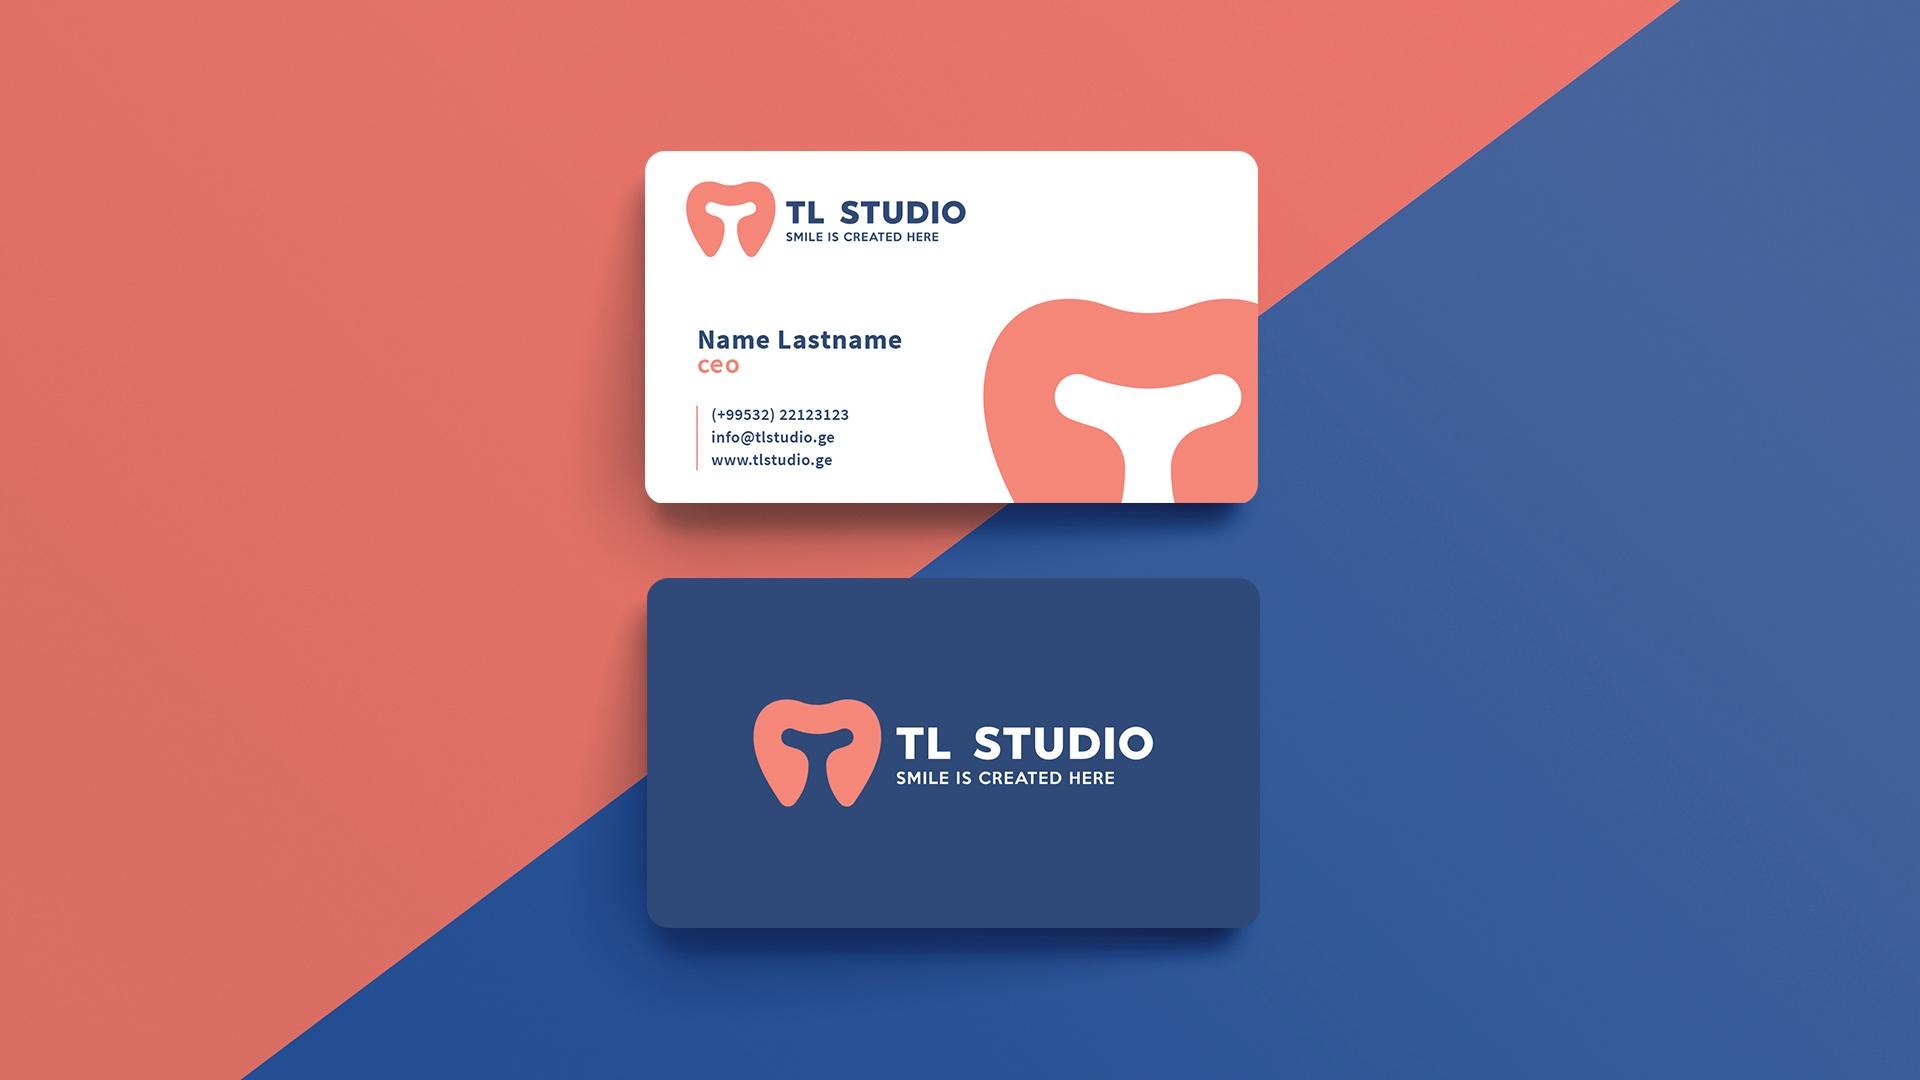 Brandit | TL Studio - ლოგოს დამზადება, ლოგოს დიზაინი, ლოგოების შექმნა, ლოგოების დამზადება, ლოგოს დამზადების ფასი, SEO ოპტიმიზაცია, ბრენდინგი, ბანერების დამზადება, ლოგოტიპის შექმნა, ლოგოტიპების დიზაინი, ოპტიმიზაცია, facebook დიზაინი, ვებგვერდის დიზაინი, ლოგოების დიზაინი, ლოგოტიპების დამზადება, saitebis damzadena, logoebis damzadena, saitis damzadeba, logos damzadeba,